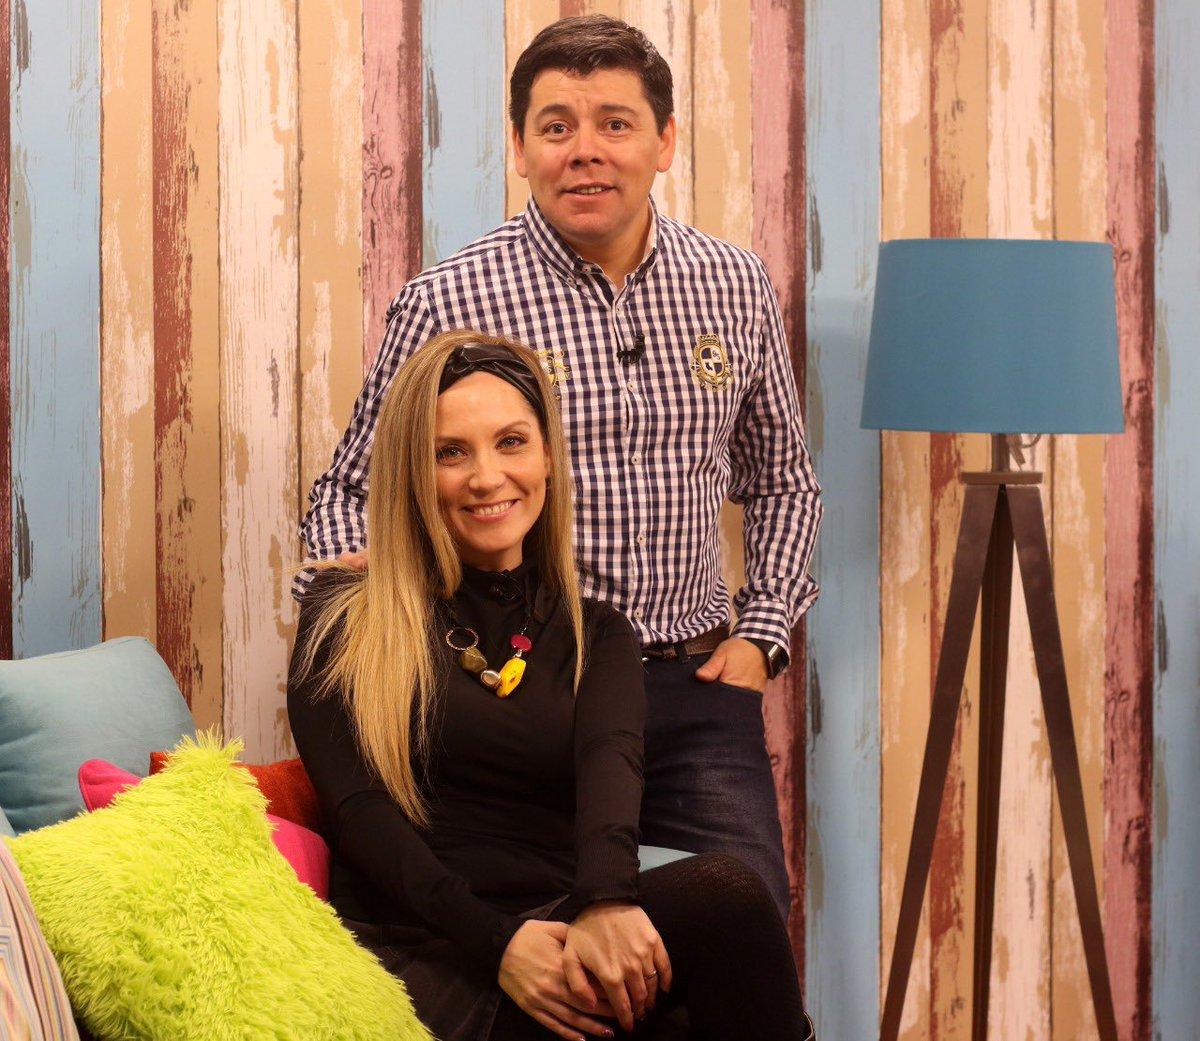 ITVPatagonia's photo on #FelizSemana